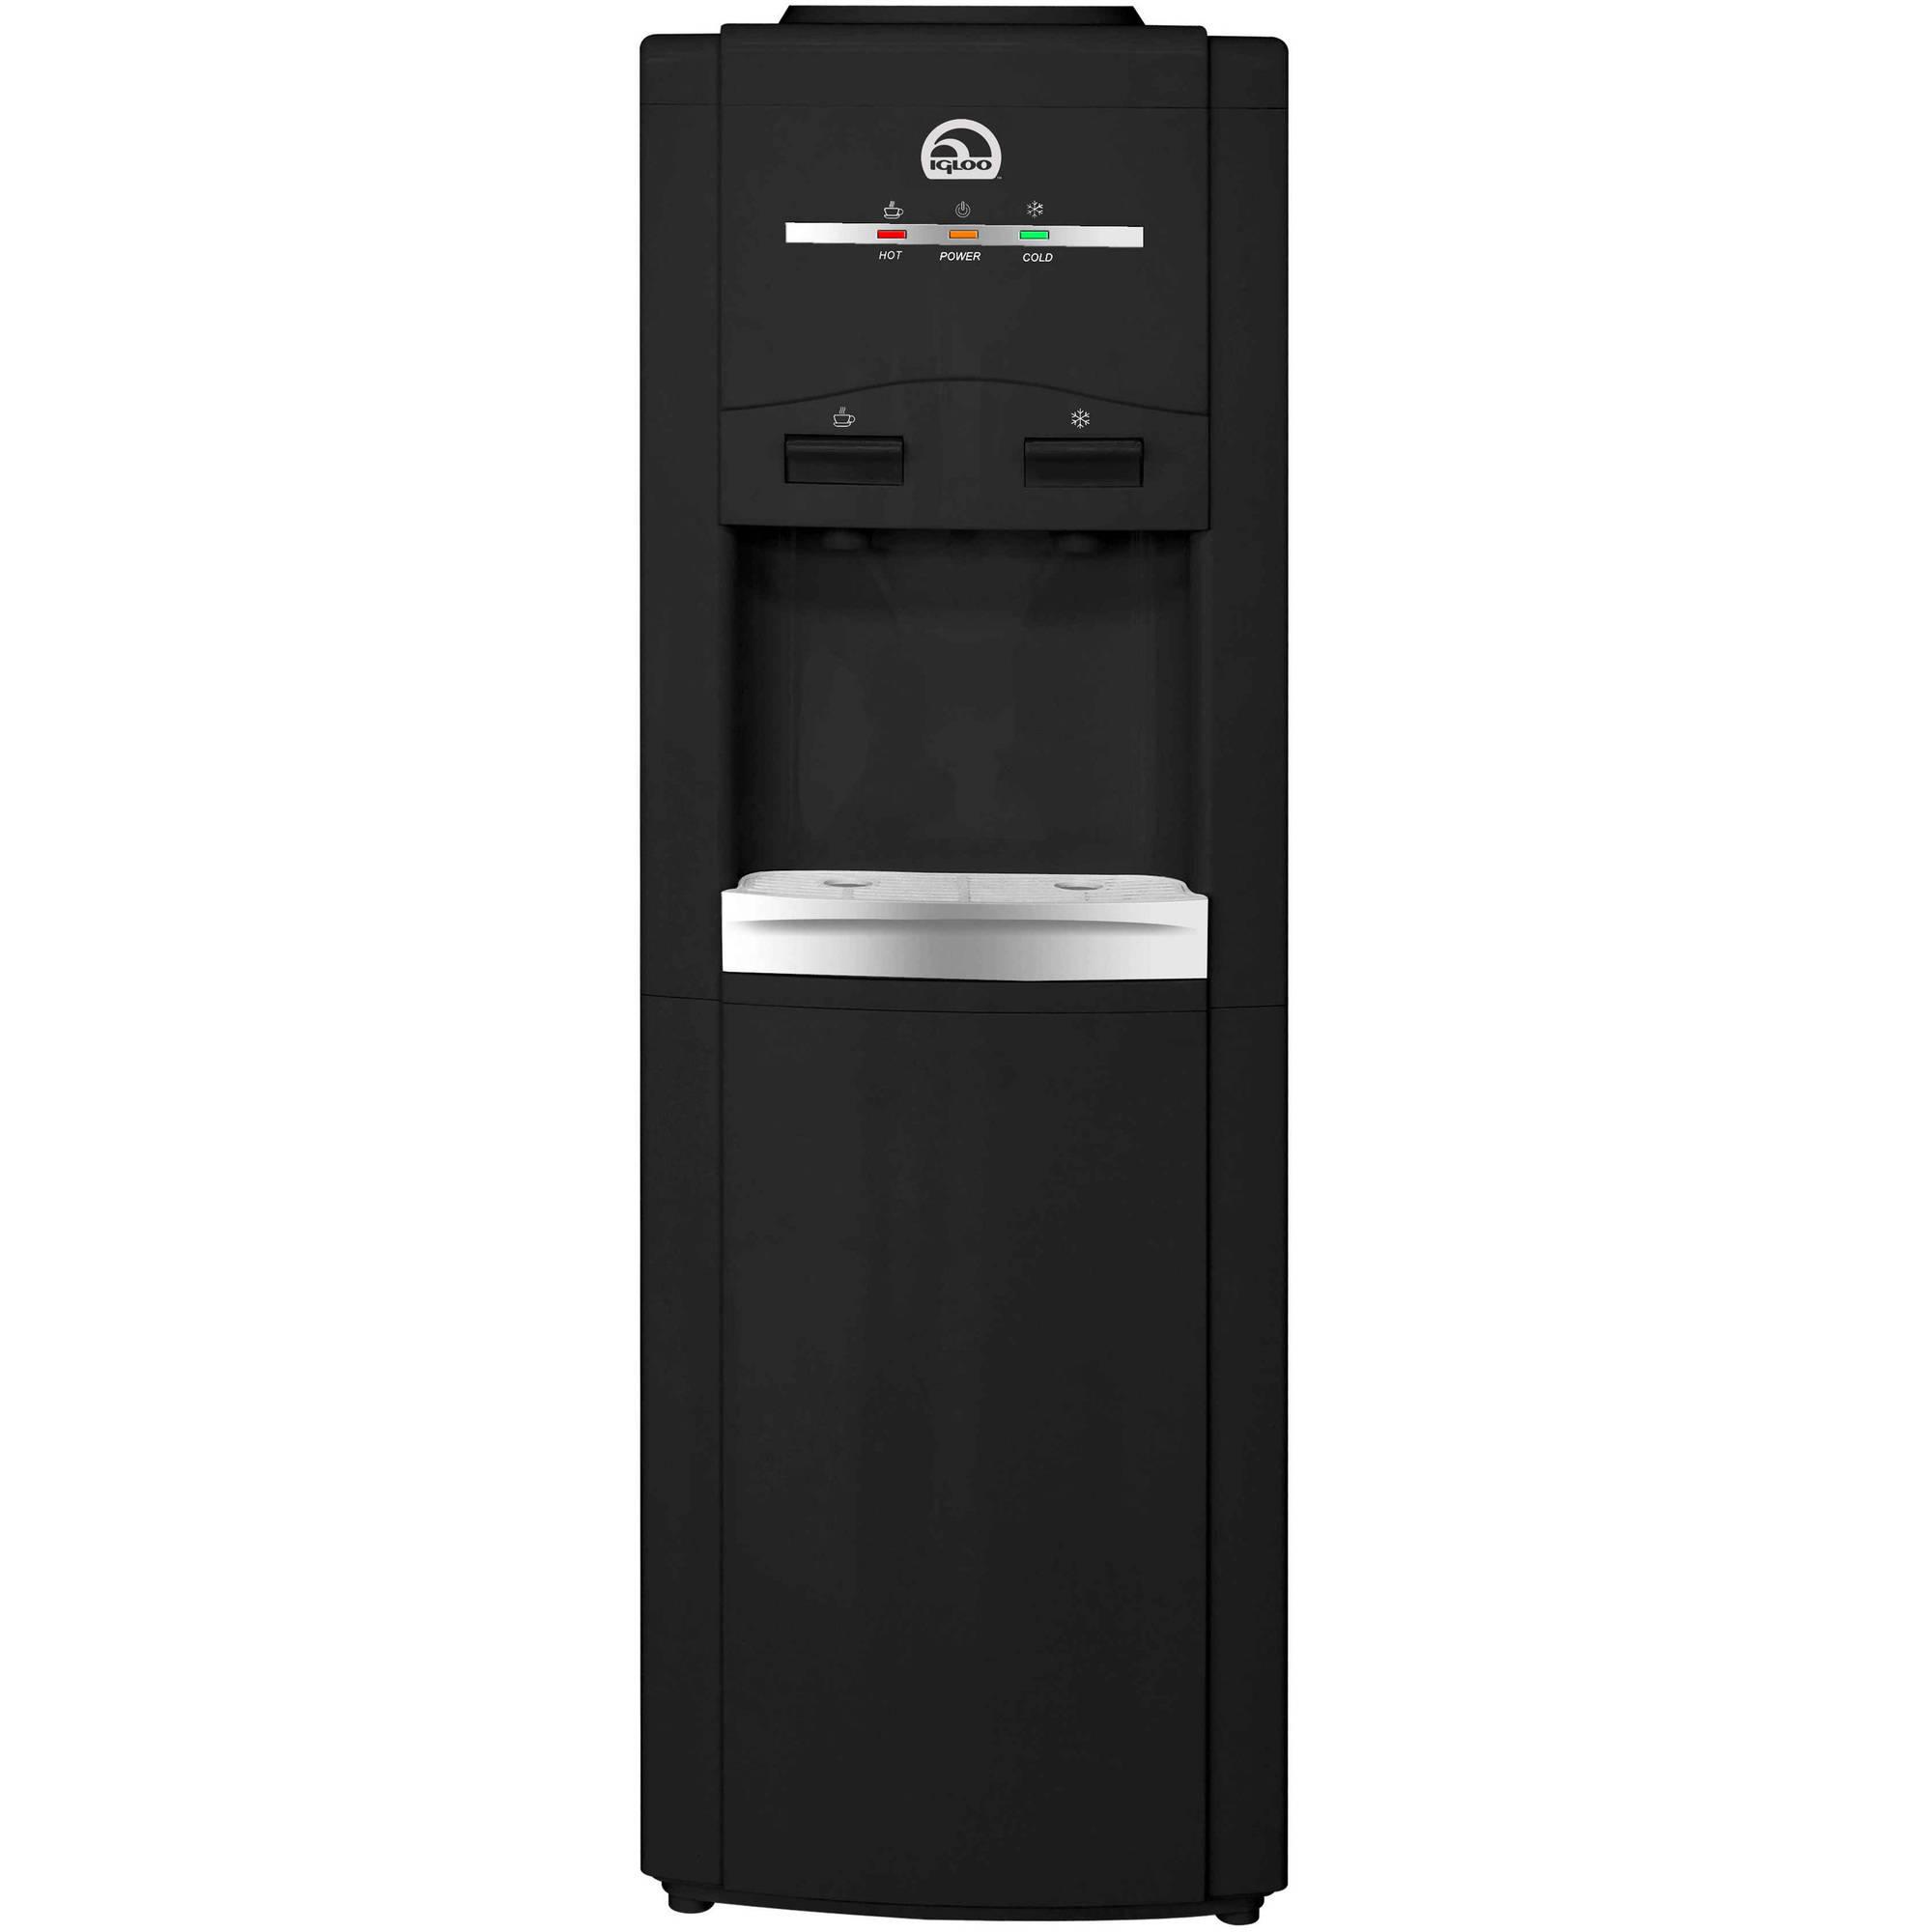 Igloo Water Cooler/Dispenser, Black